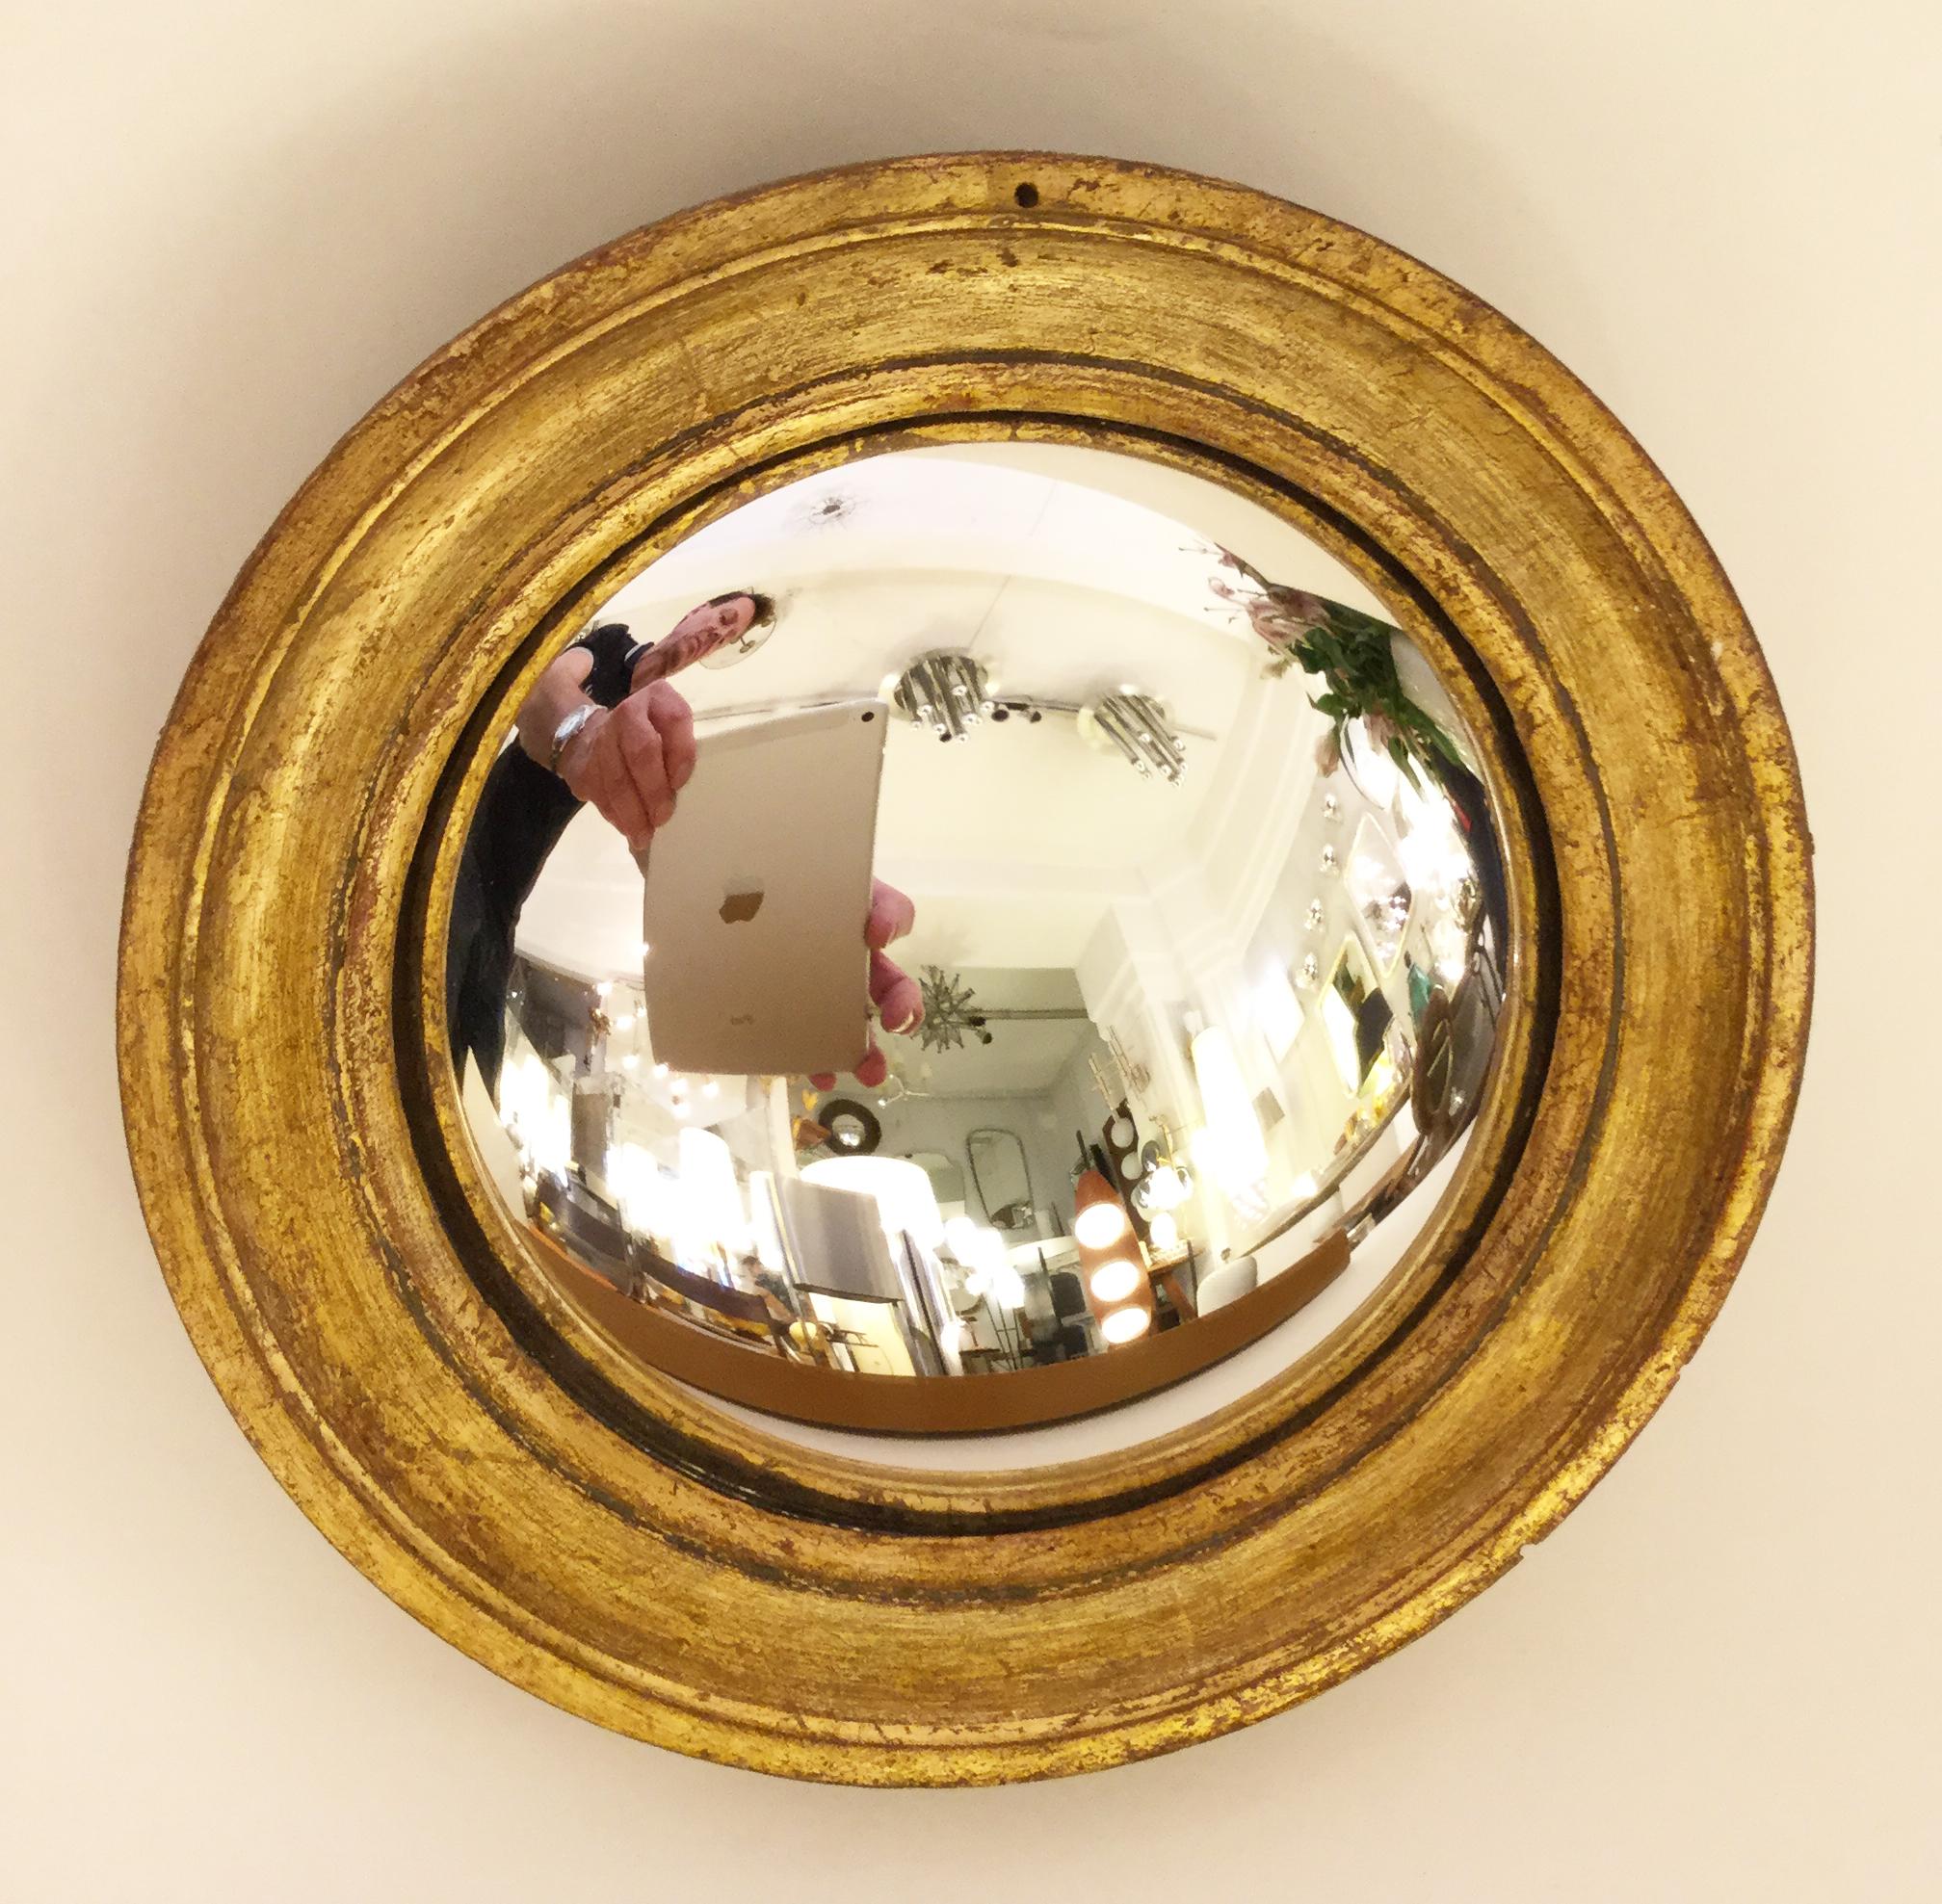 Miroir sorci re galerie yvan royer for Miroir sorciere